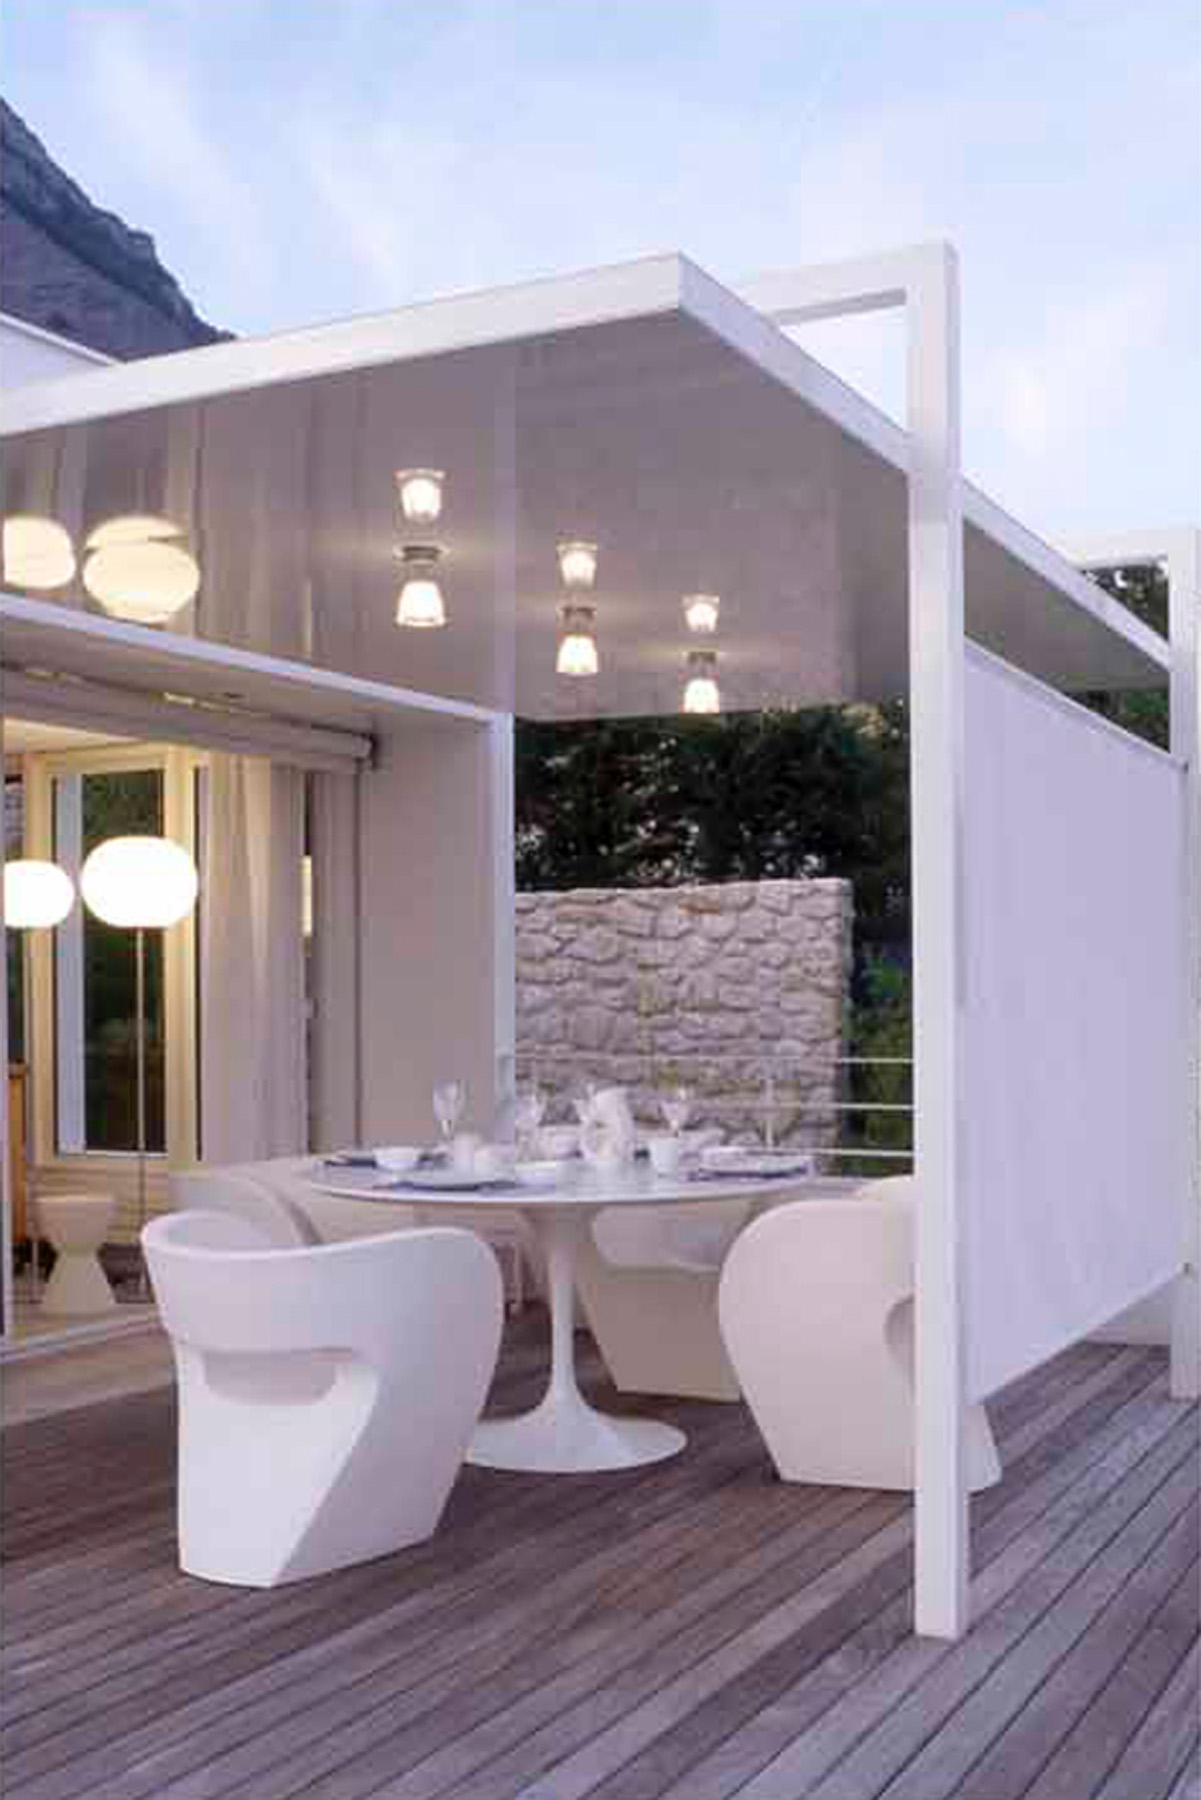 Janik architecte maison individuelle meylan 2 for Architecte maison individuelle